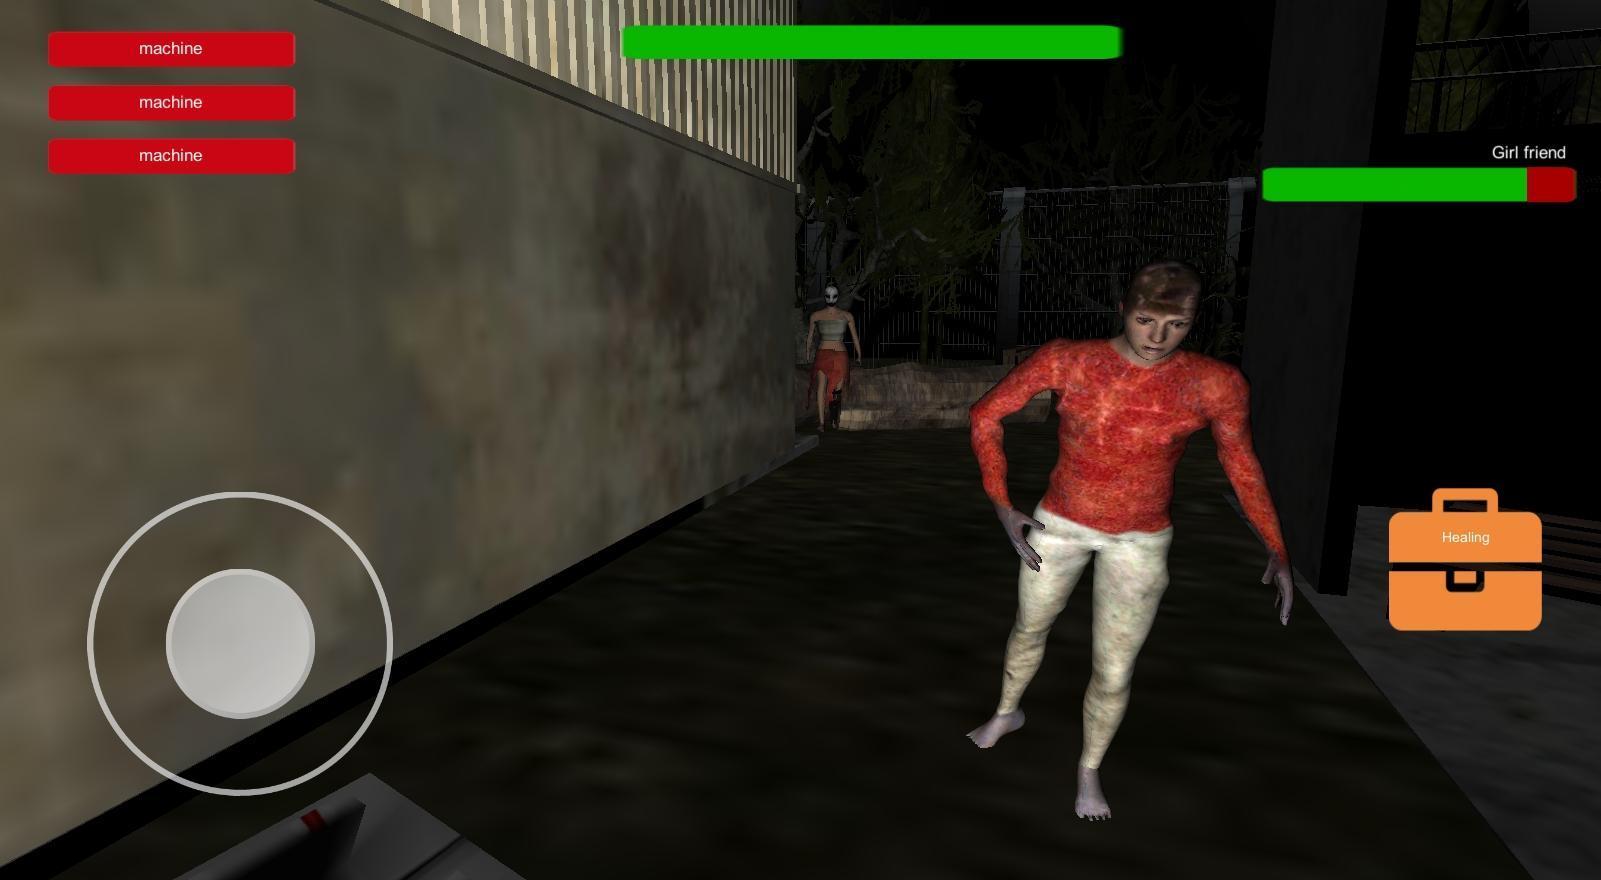 Family Creepy Scary Evil Scream Horror Game 1.6 Screenshot 5